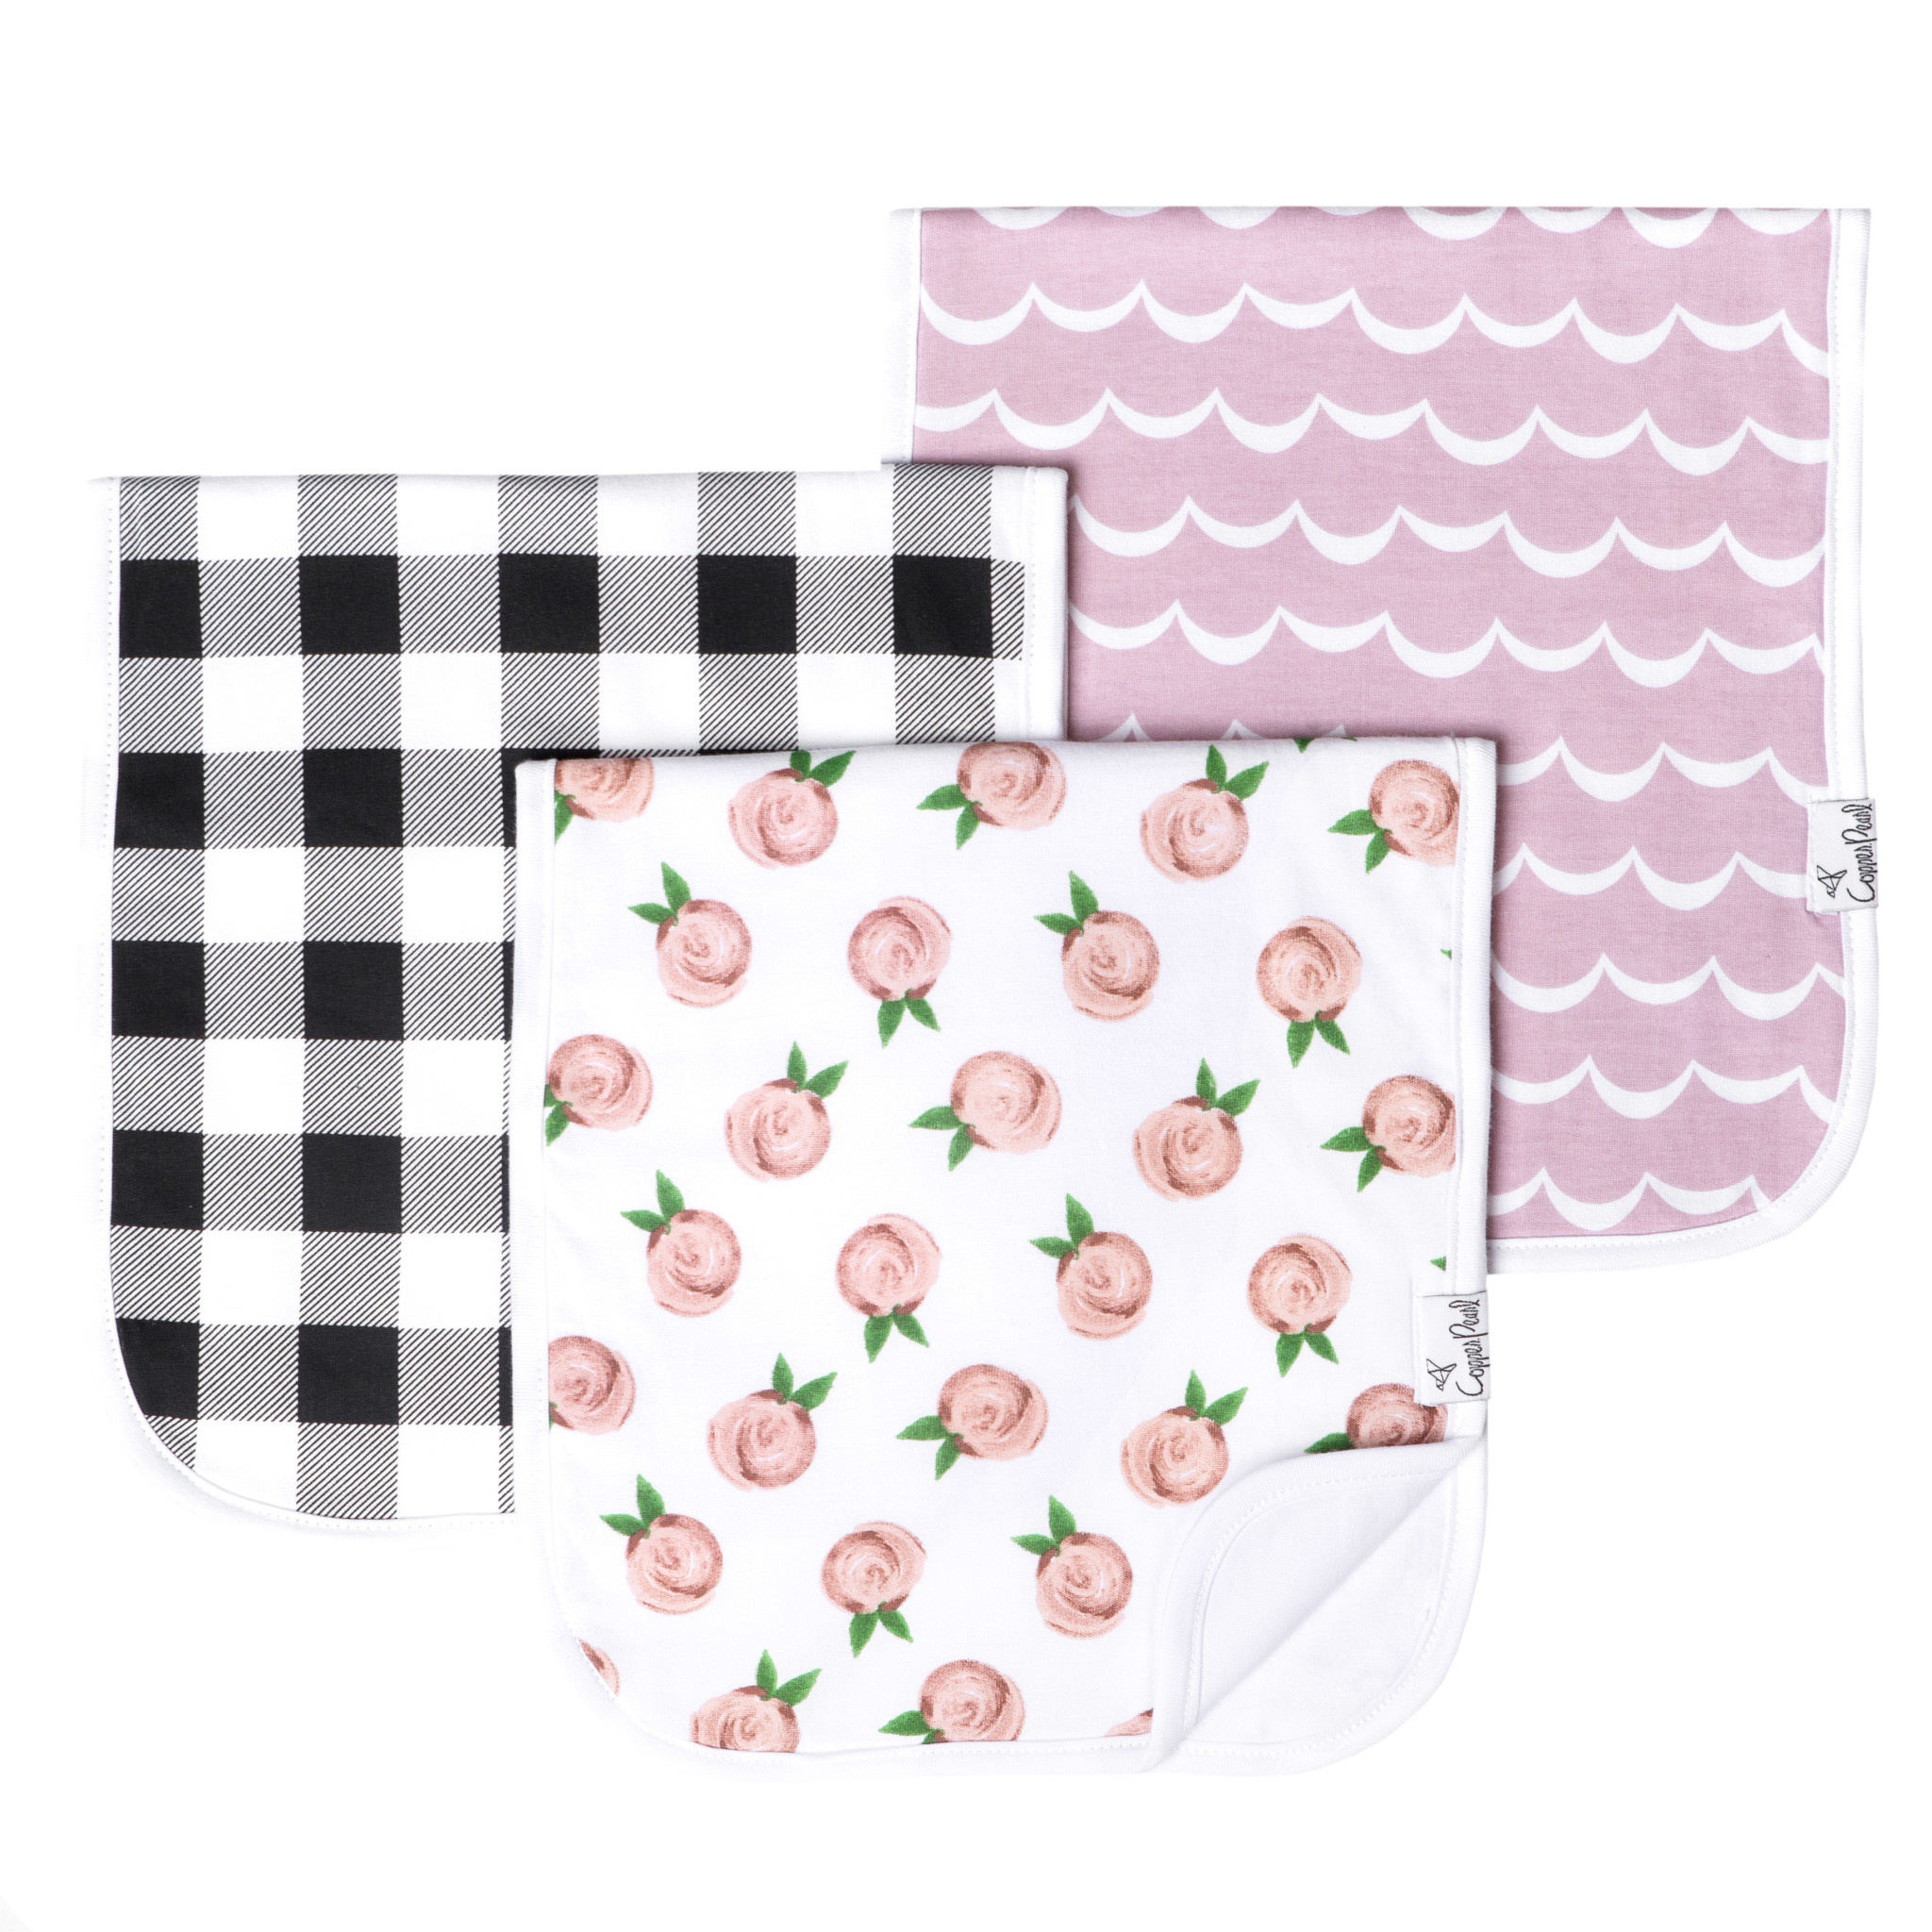 Copper Pearl Burp Cloth Set - Rosie